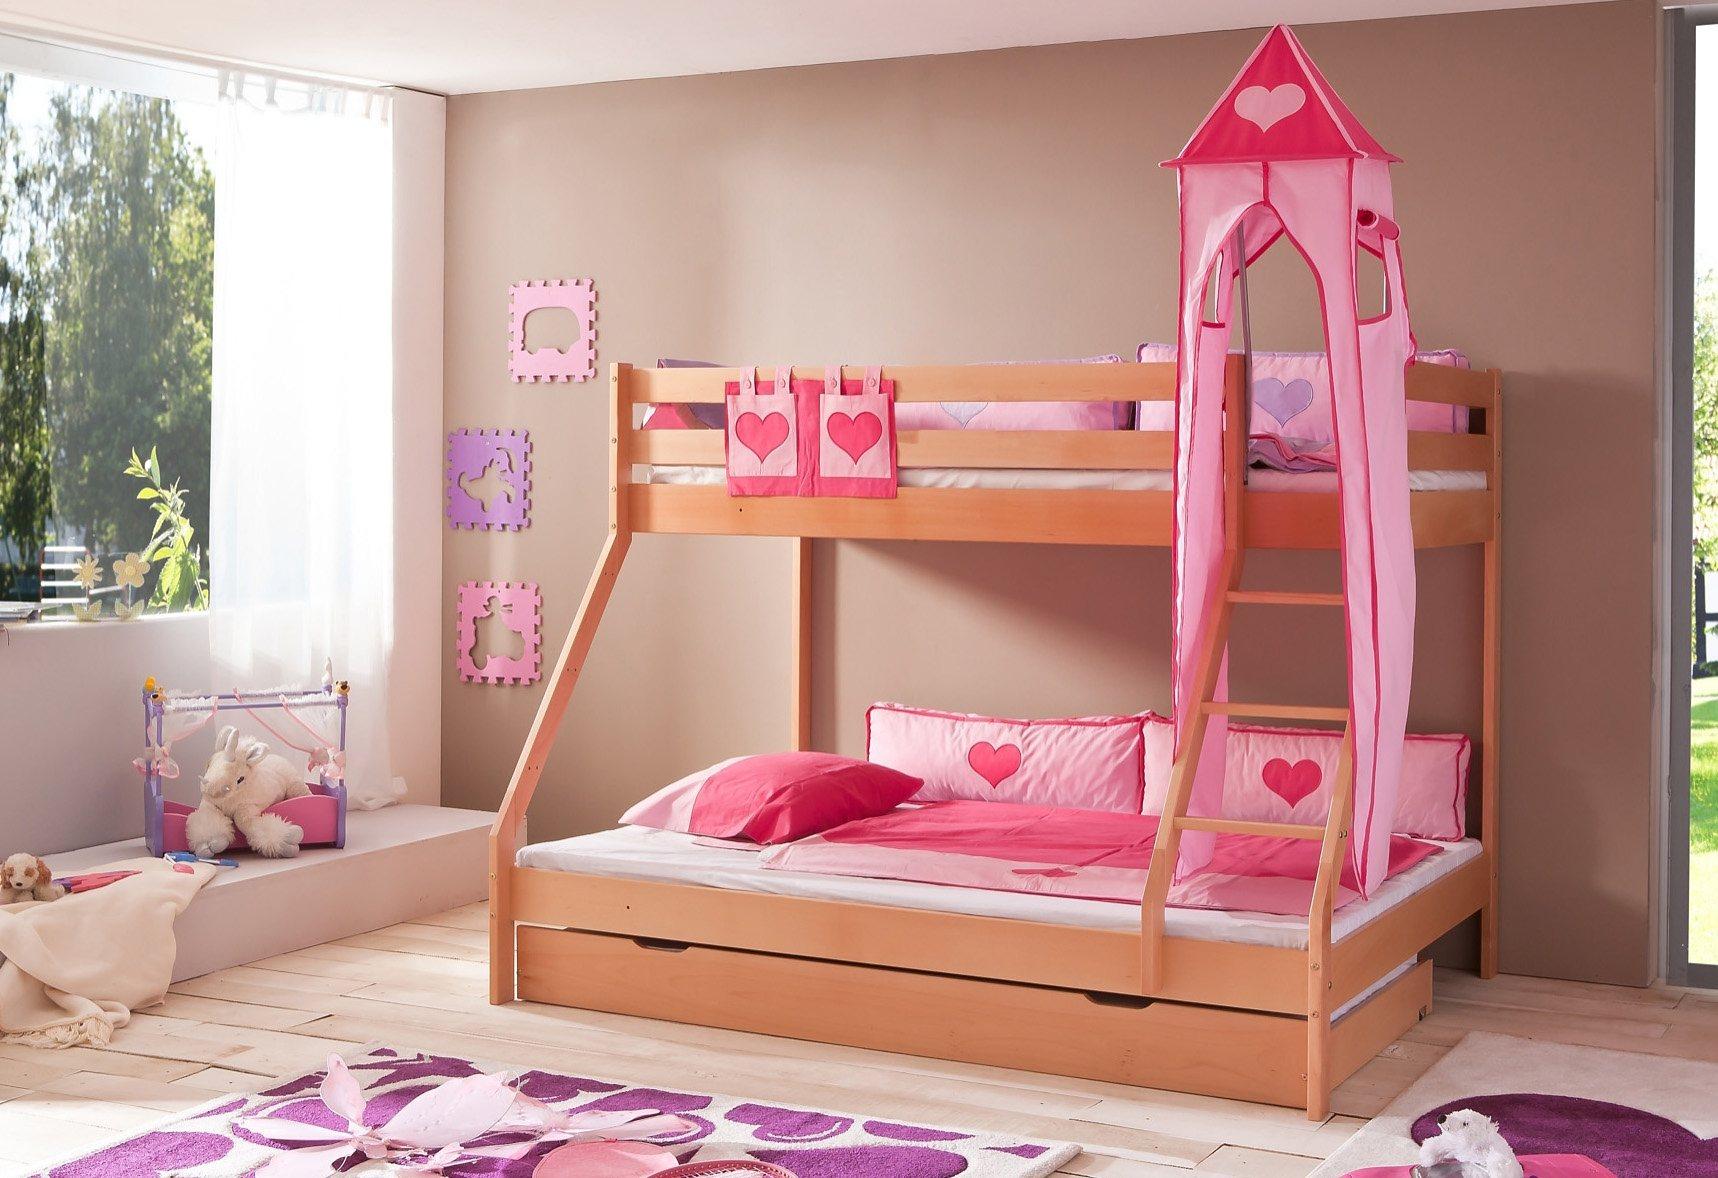 Relita Etagenbett, Set 3-tlg. »Mike« | Kinderzimmer > Kinderbetten > Etagenbetten | Weiß | Massiver - Buche - Textil - Massiv | Relita